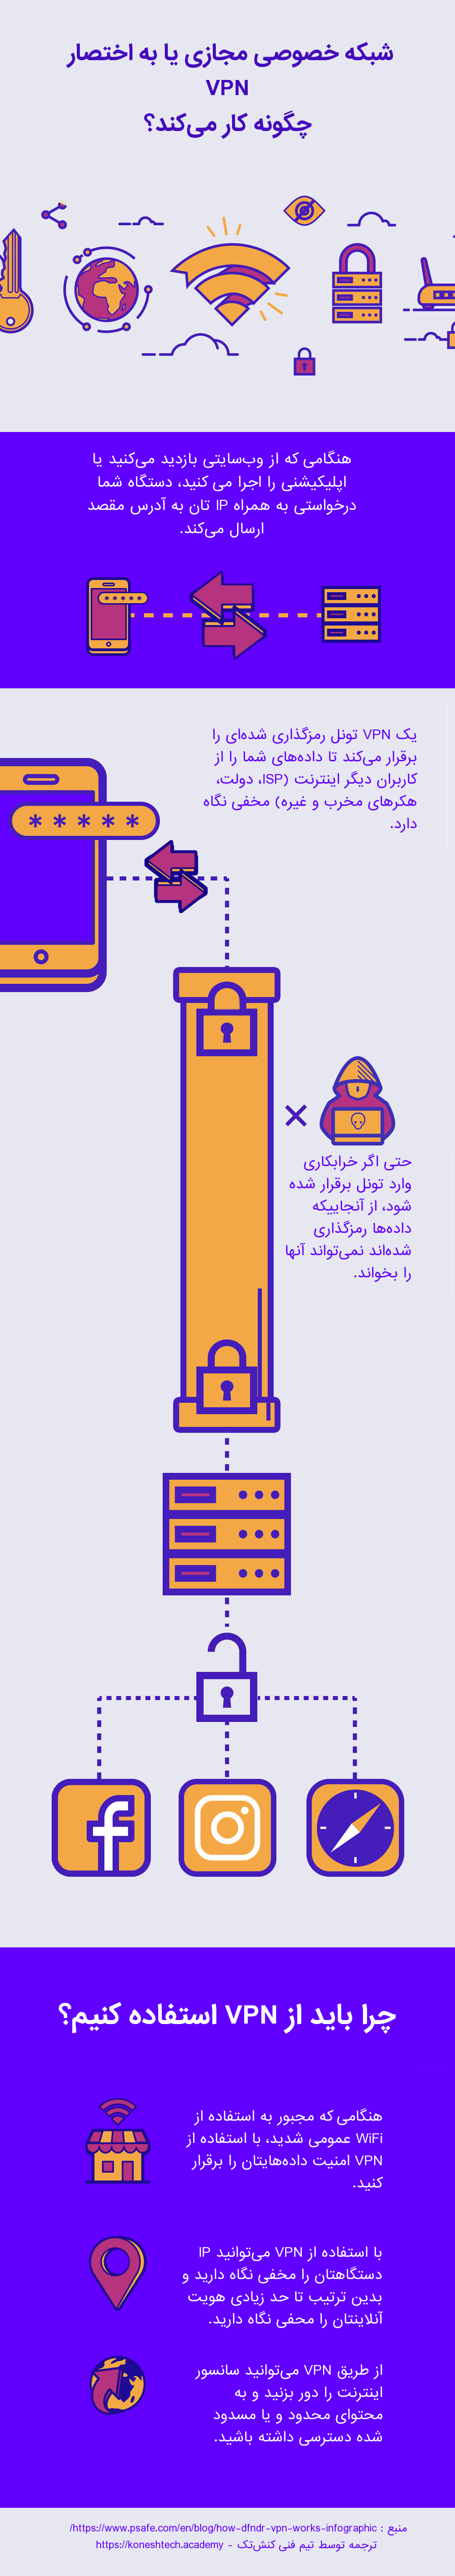 اینفوگرافیک VPN چگونه کار میکند